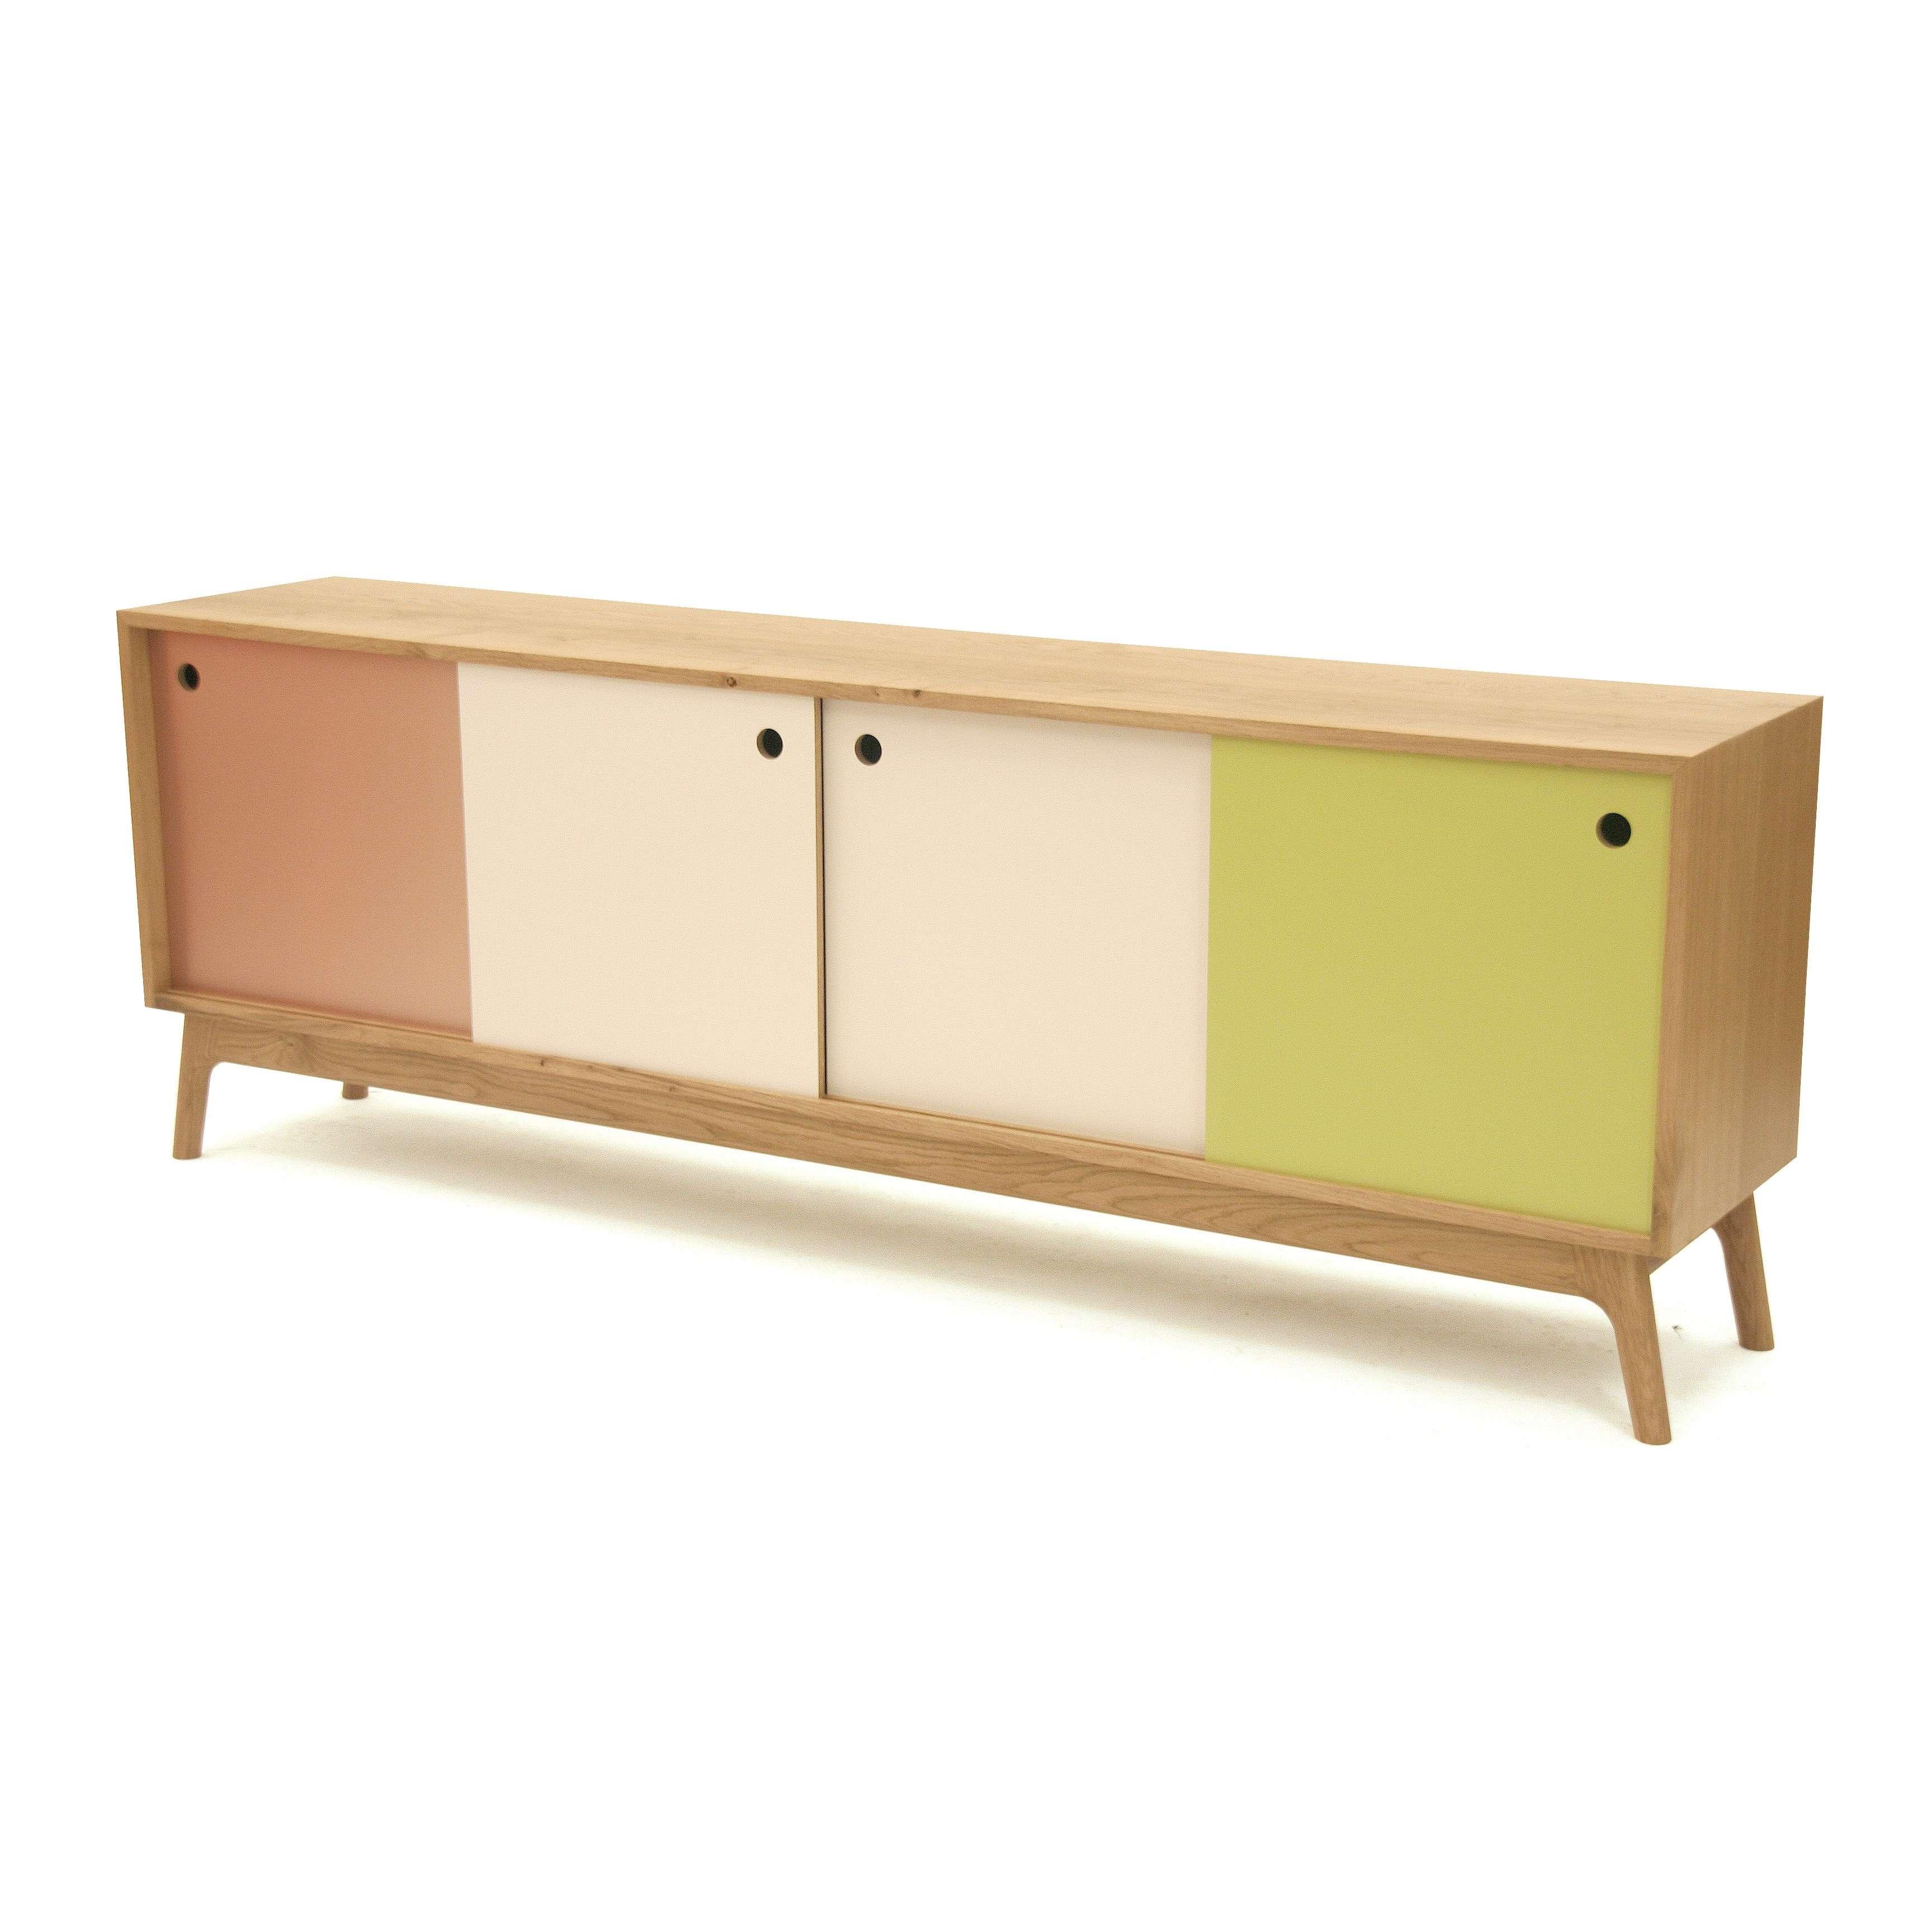 Design 20:20 Sideboard Triple For Bespoke Sideboards (View 7 of 20)